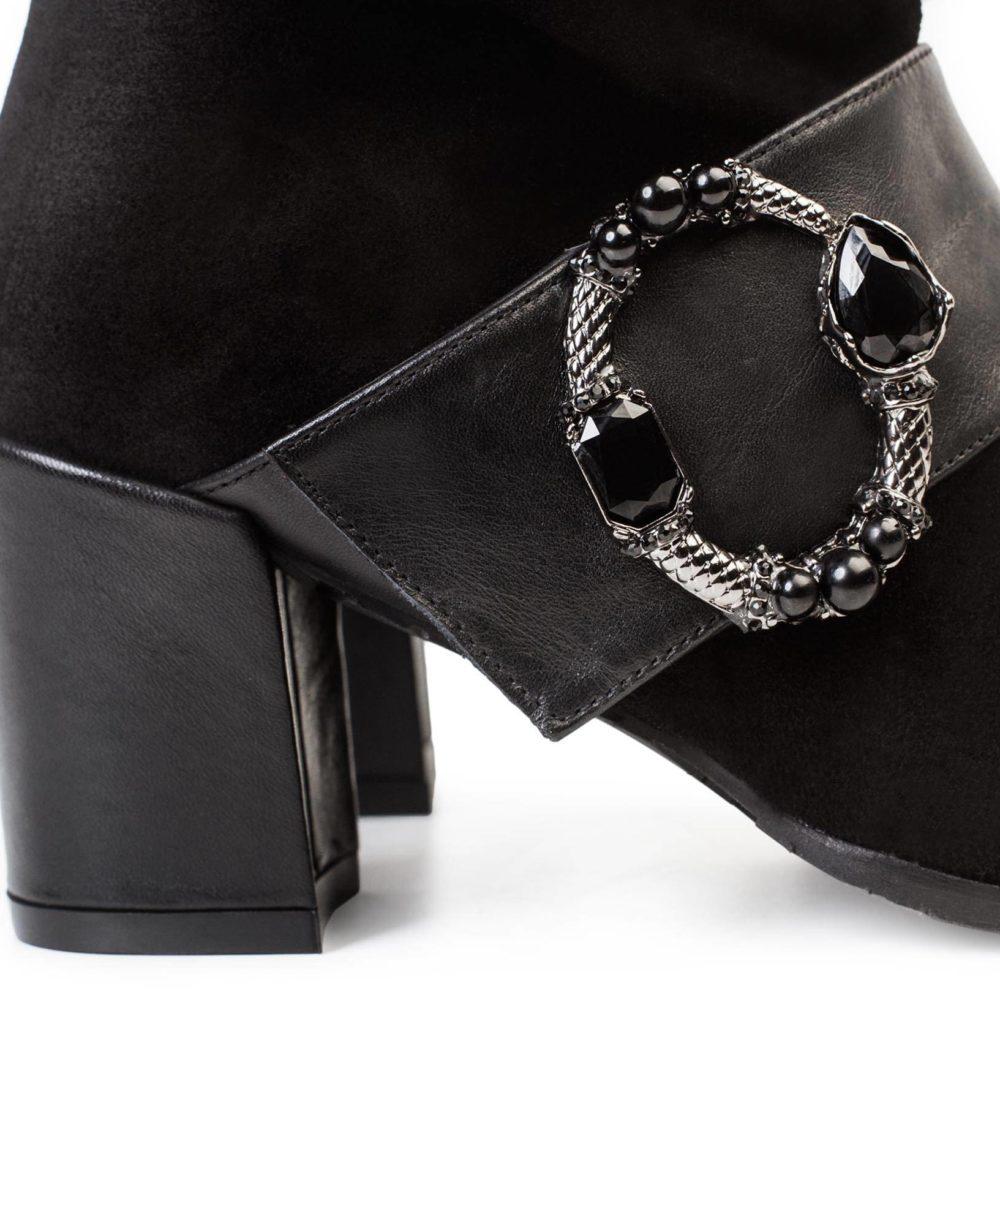 Leather ankle boots  Paco Gil - P-3841 Black Velour-Bravo Detalle